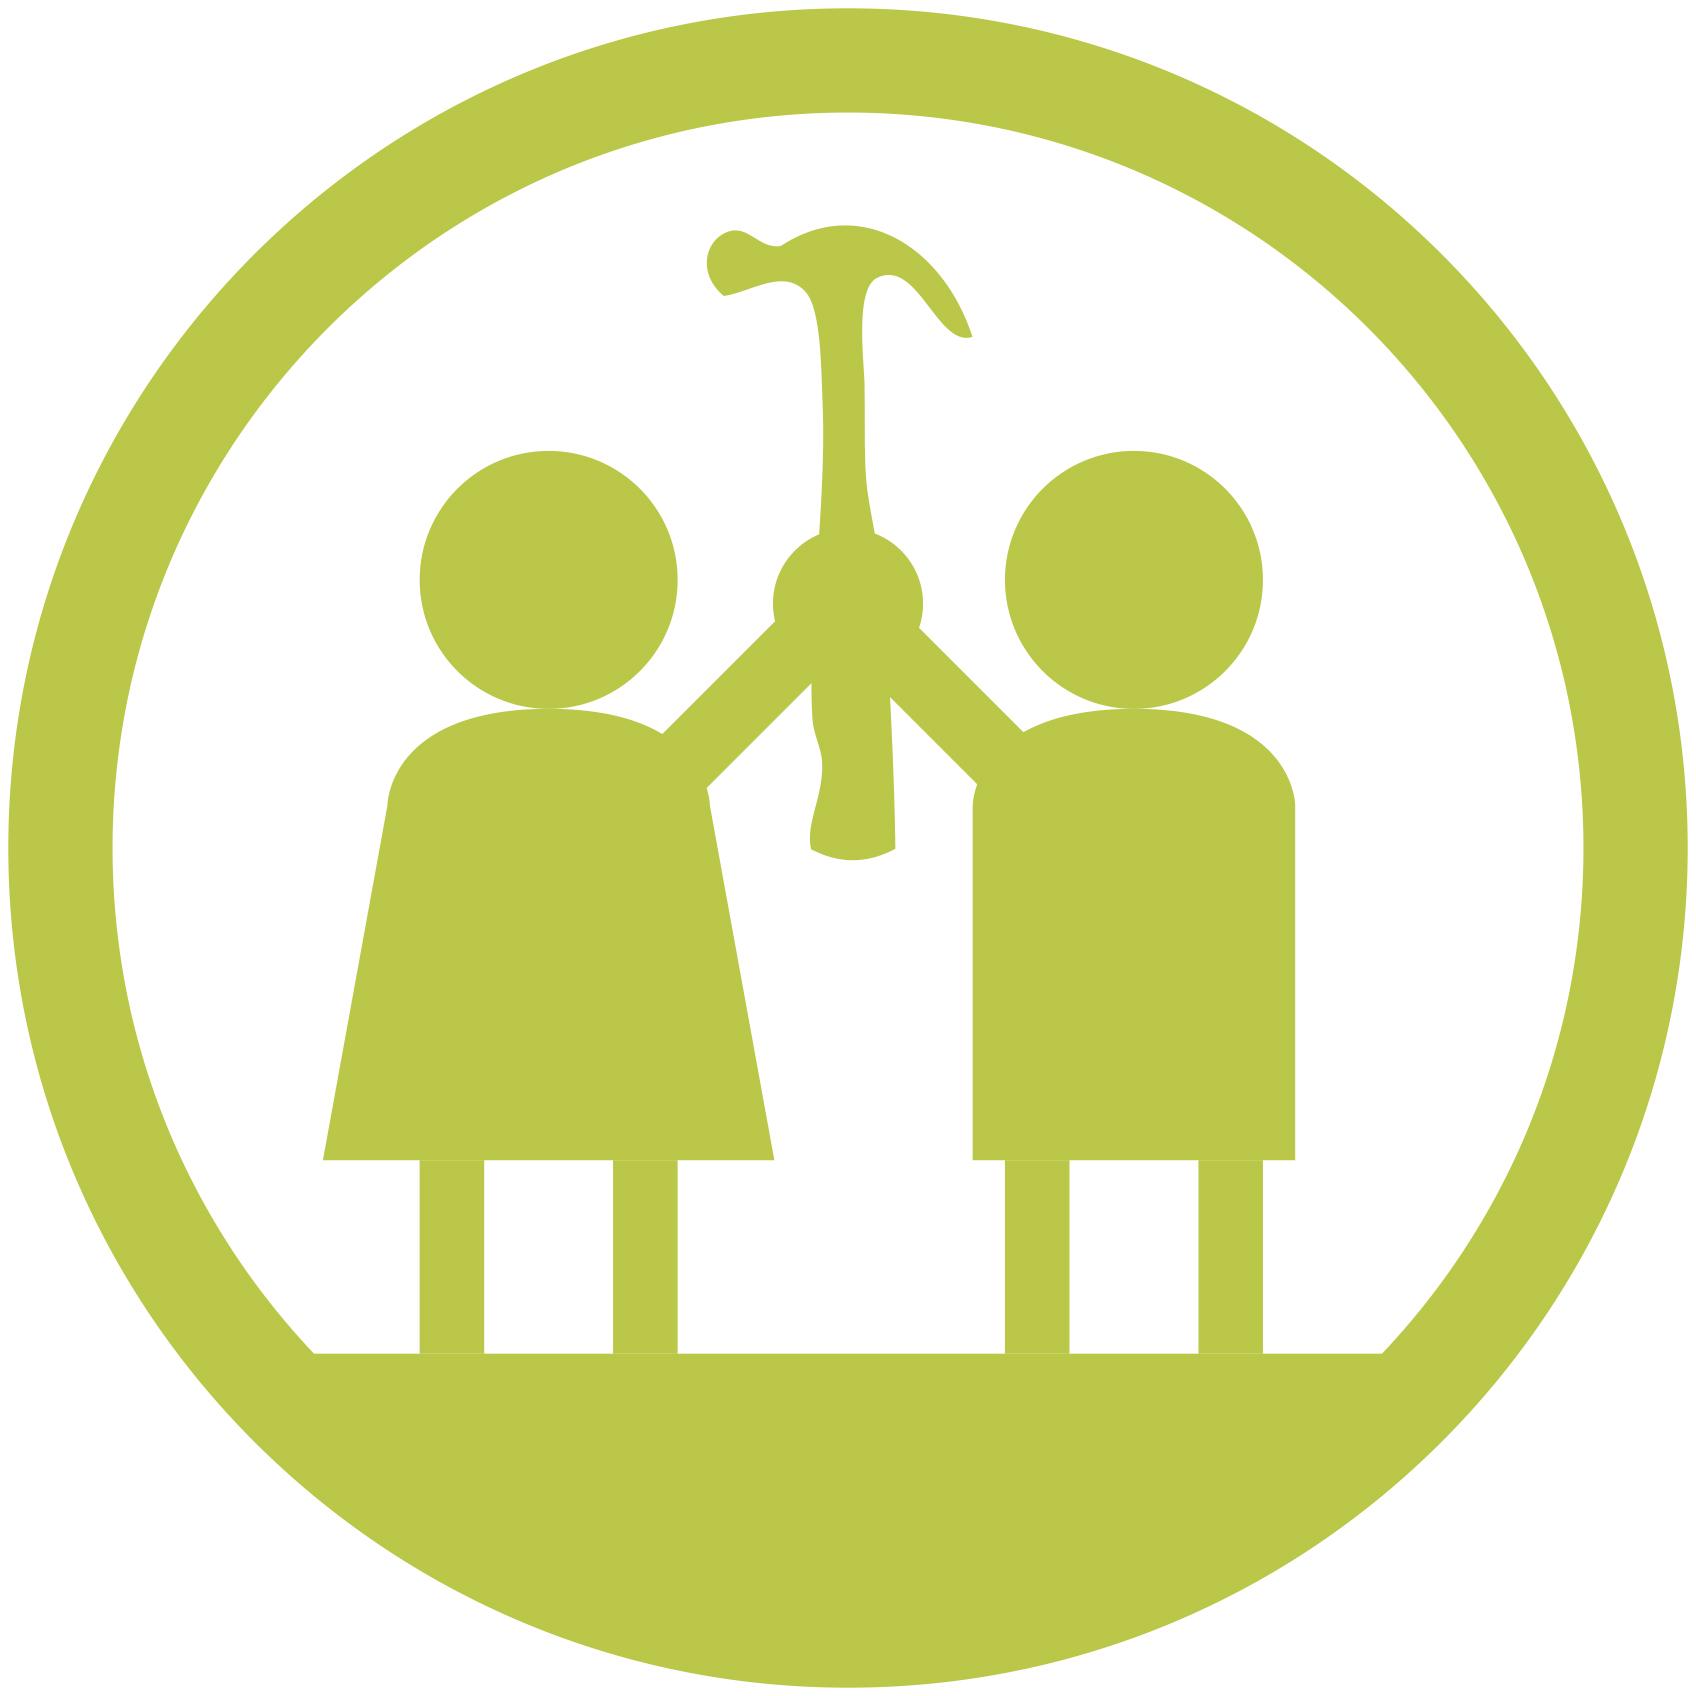 AIA_Initiatives community service.jpg